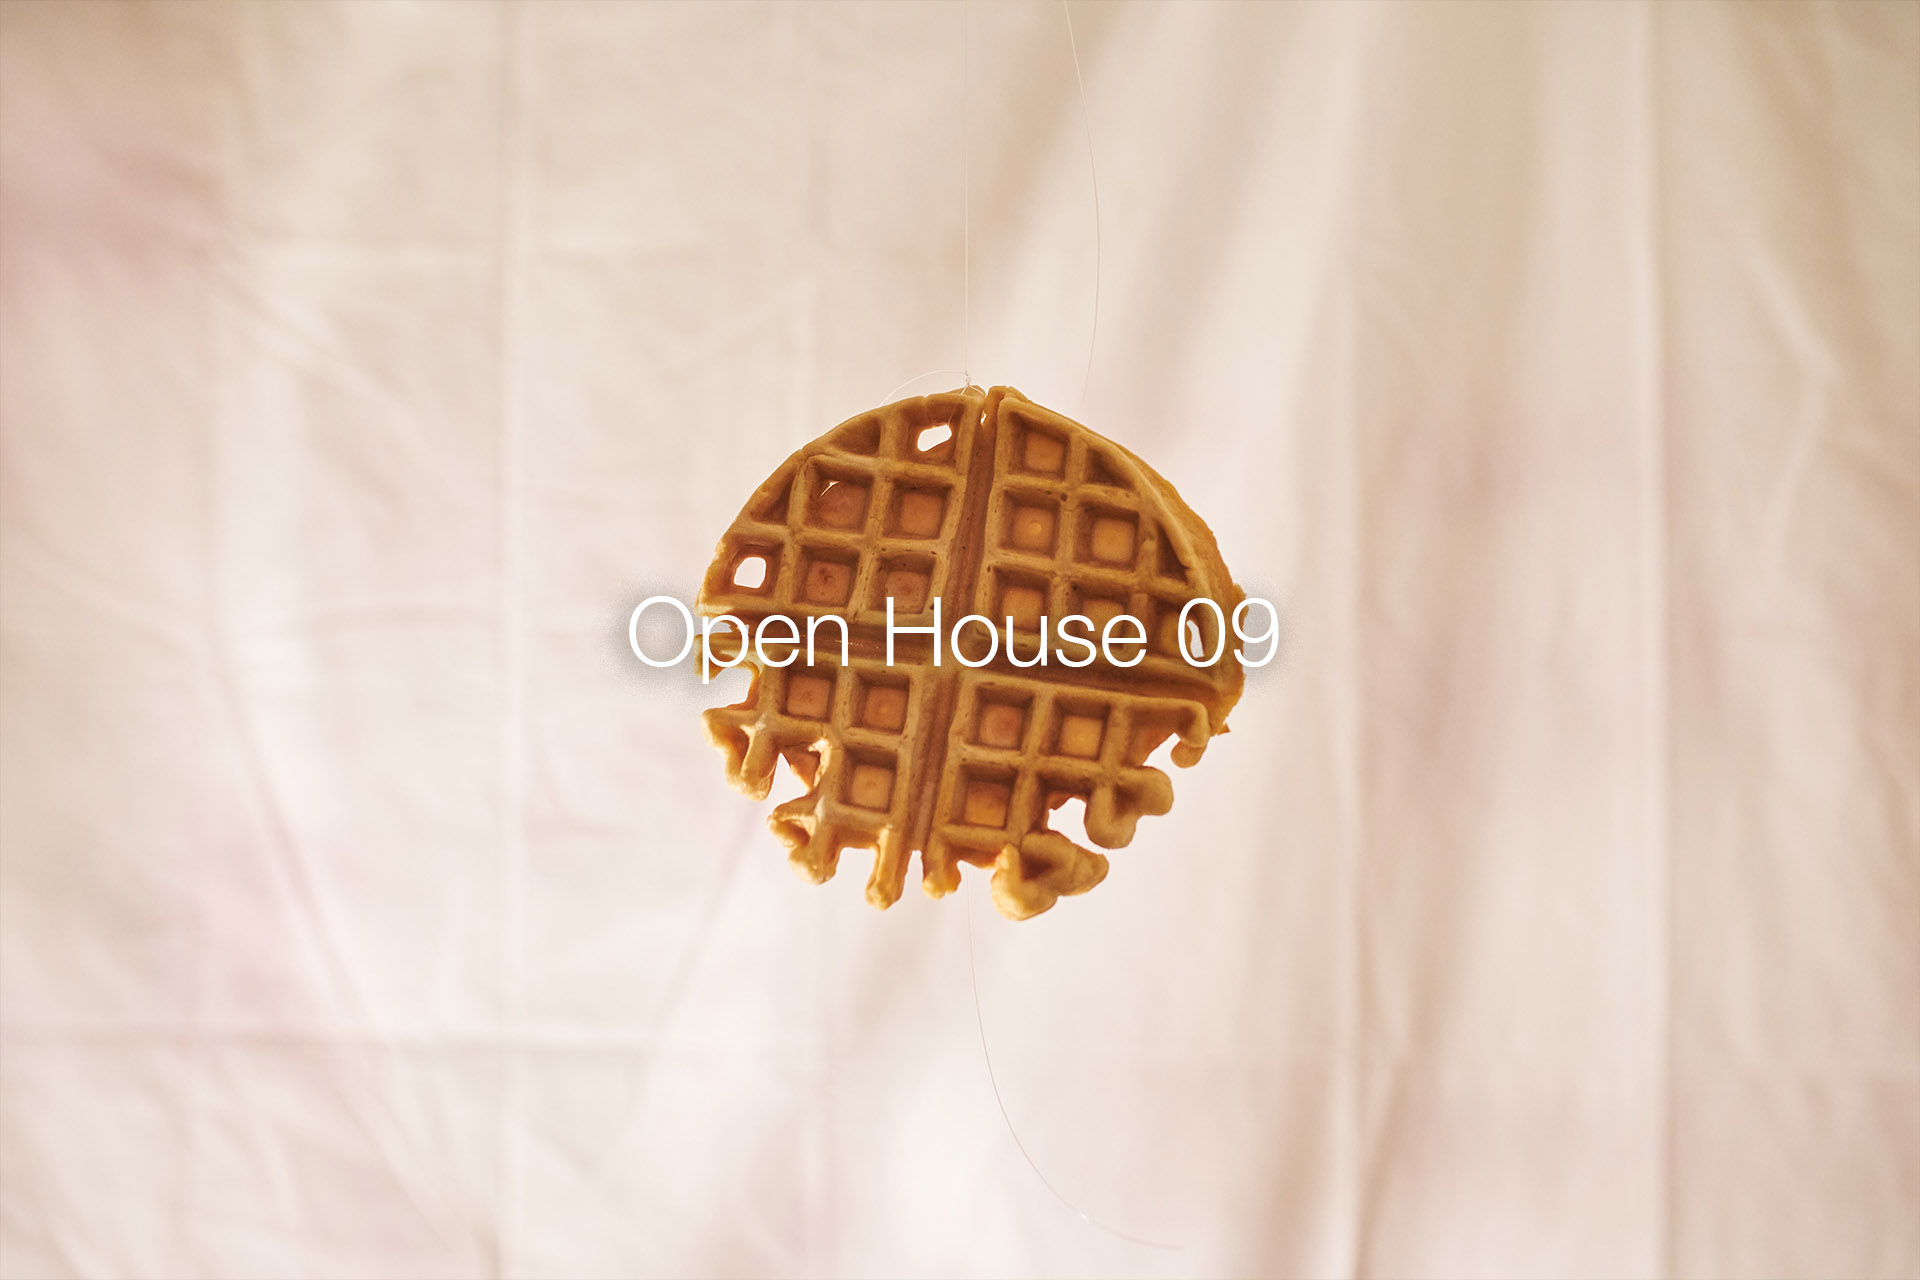 OpenHouse09.jpg